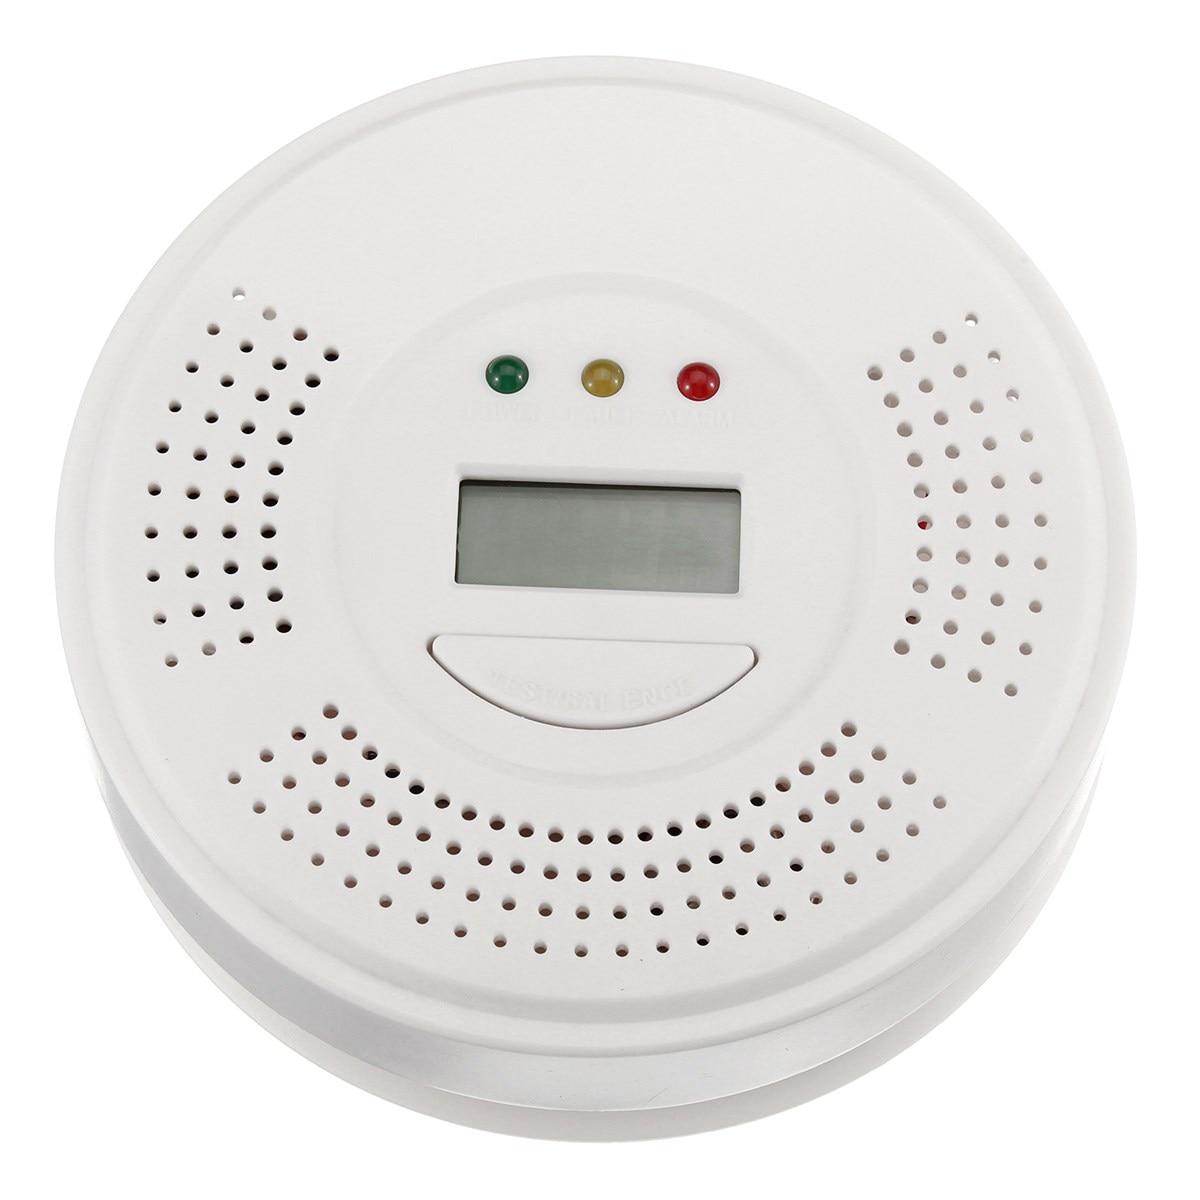 NEW Safurance Audio Carbon Monoxide Detector CO Gas Alarm Warning Sensor Monitor Home Kitchen Security Safety handheld gas detector alarm portable oxygen detector co concentration carbon monoxide monitor 0 999 ppm co gas analyzer meter